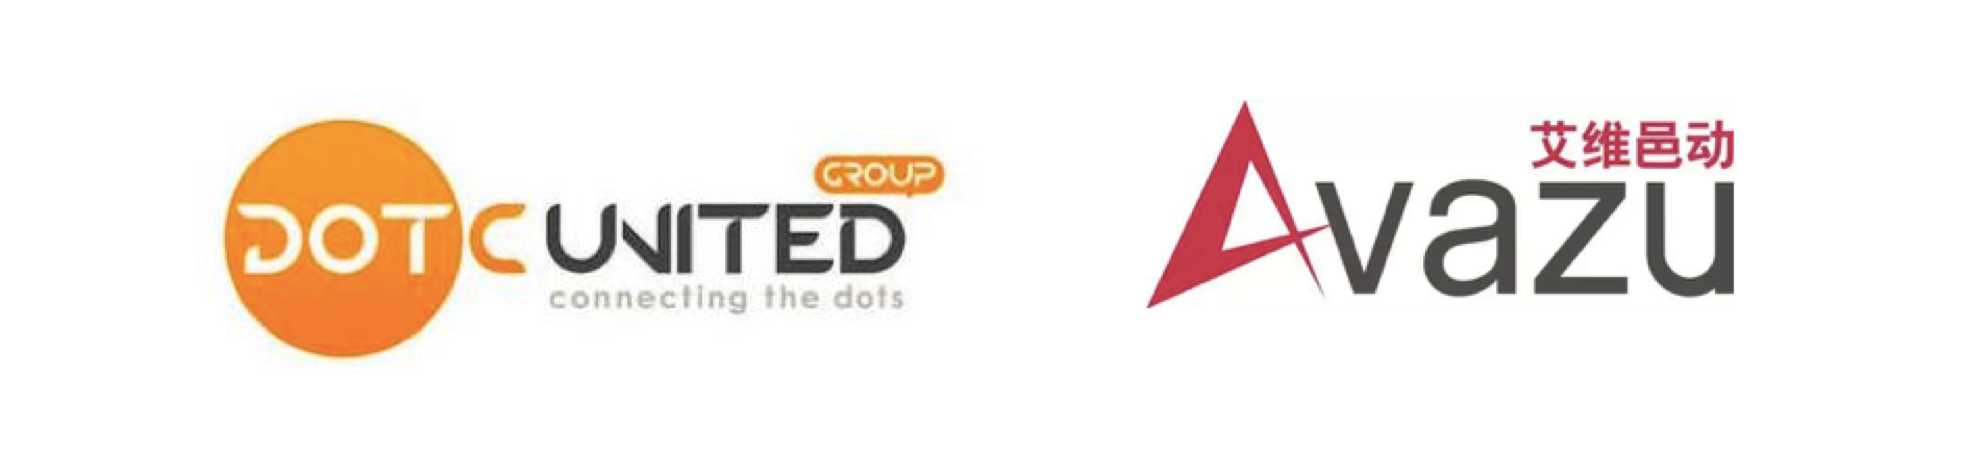 "DotC United Group获3.5亿美元B轮融资,这家中国互联网全球化推手如何借助数据洞察""客场""夺冠?"